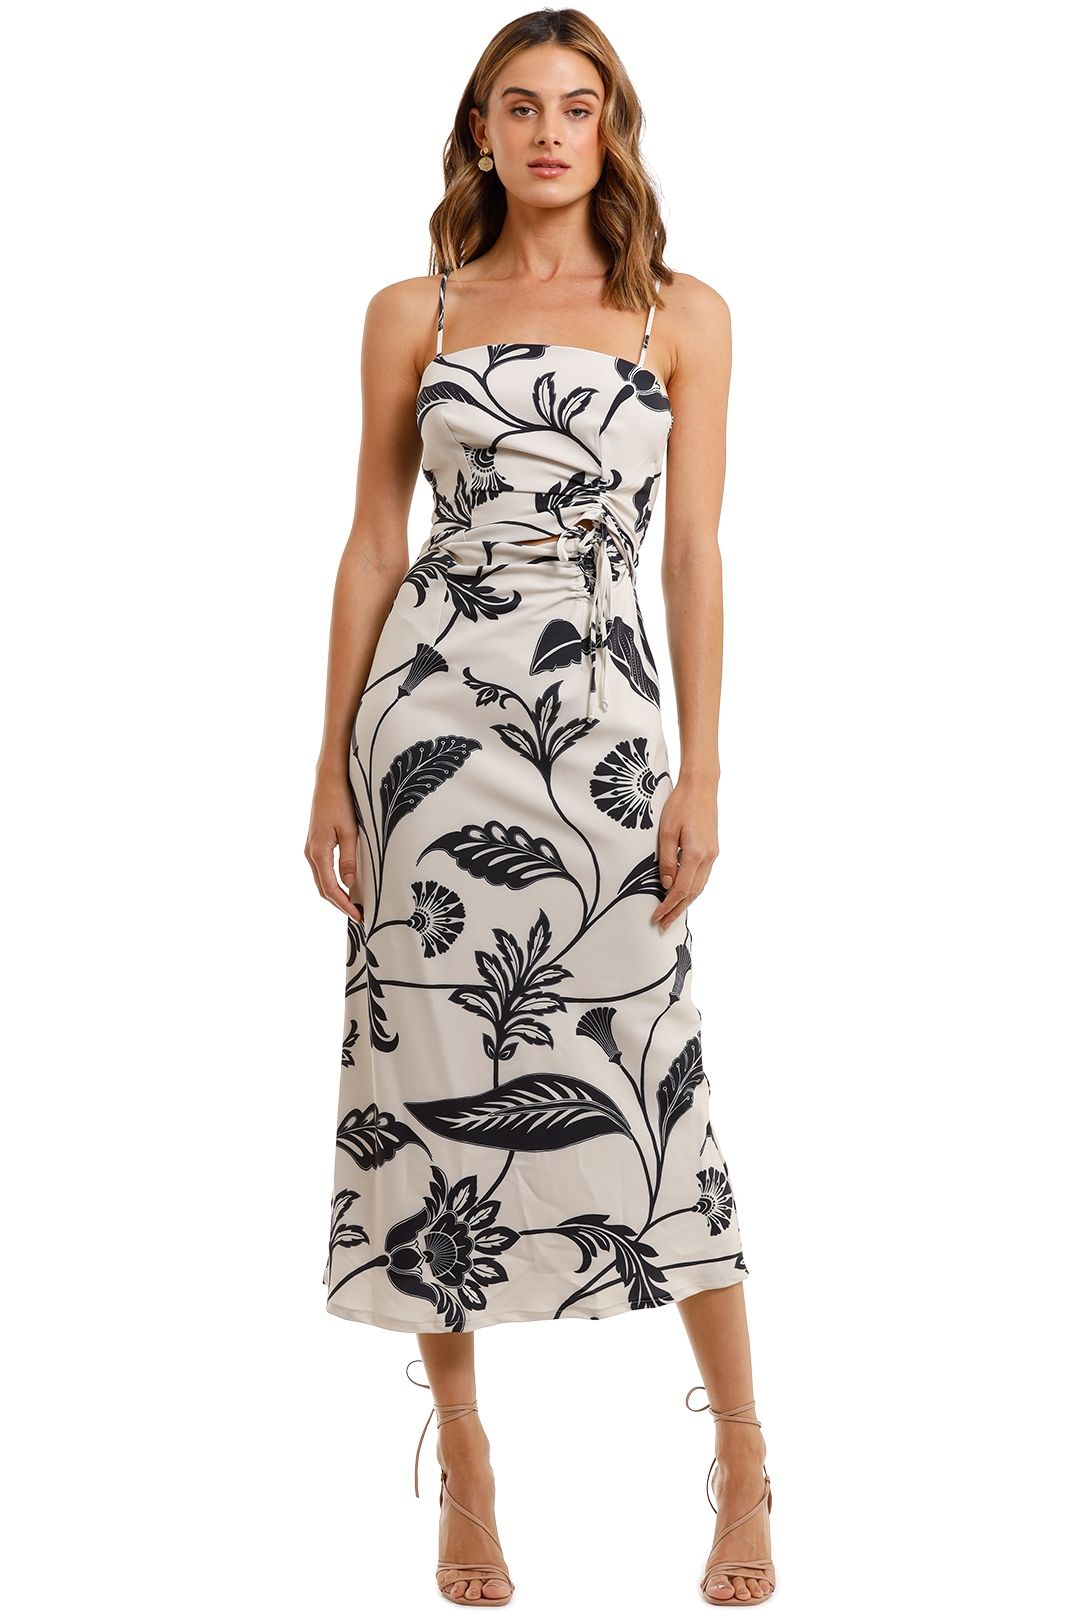 Pasduchas Solstice Drawstring Midi Dress Floral